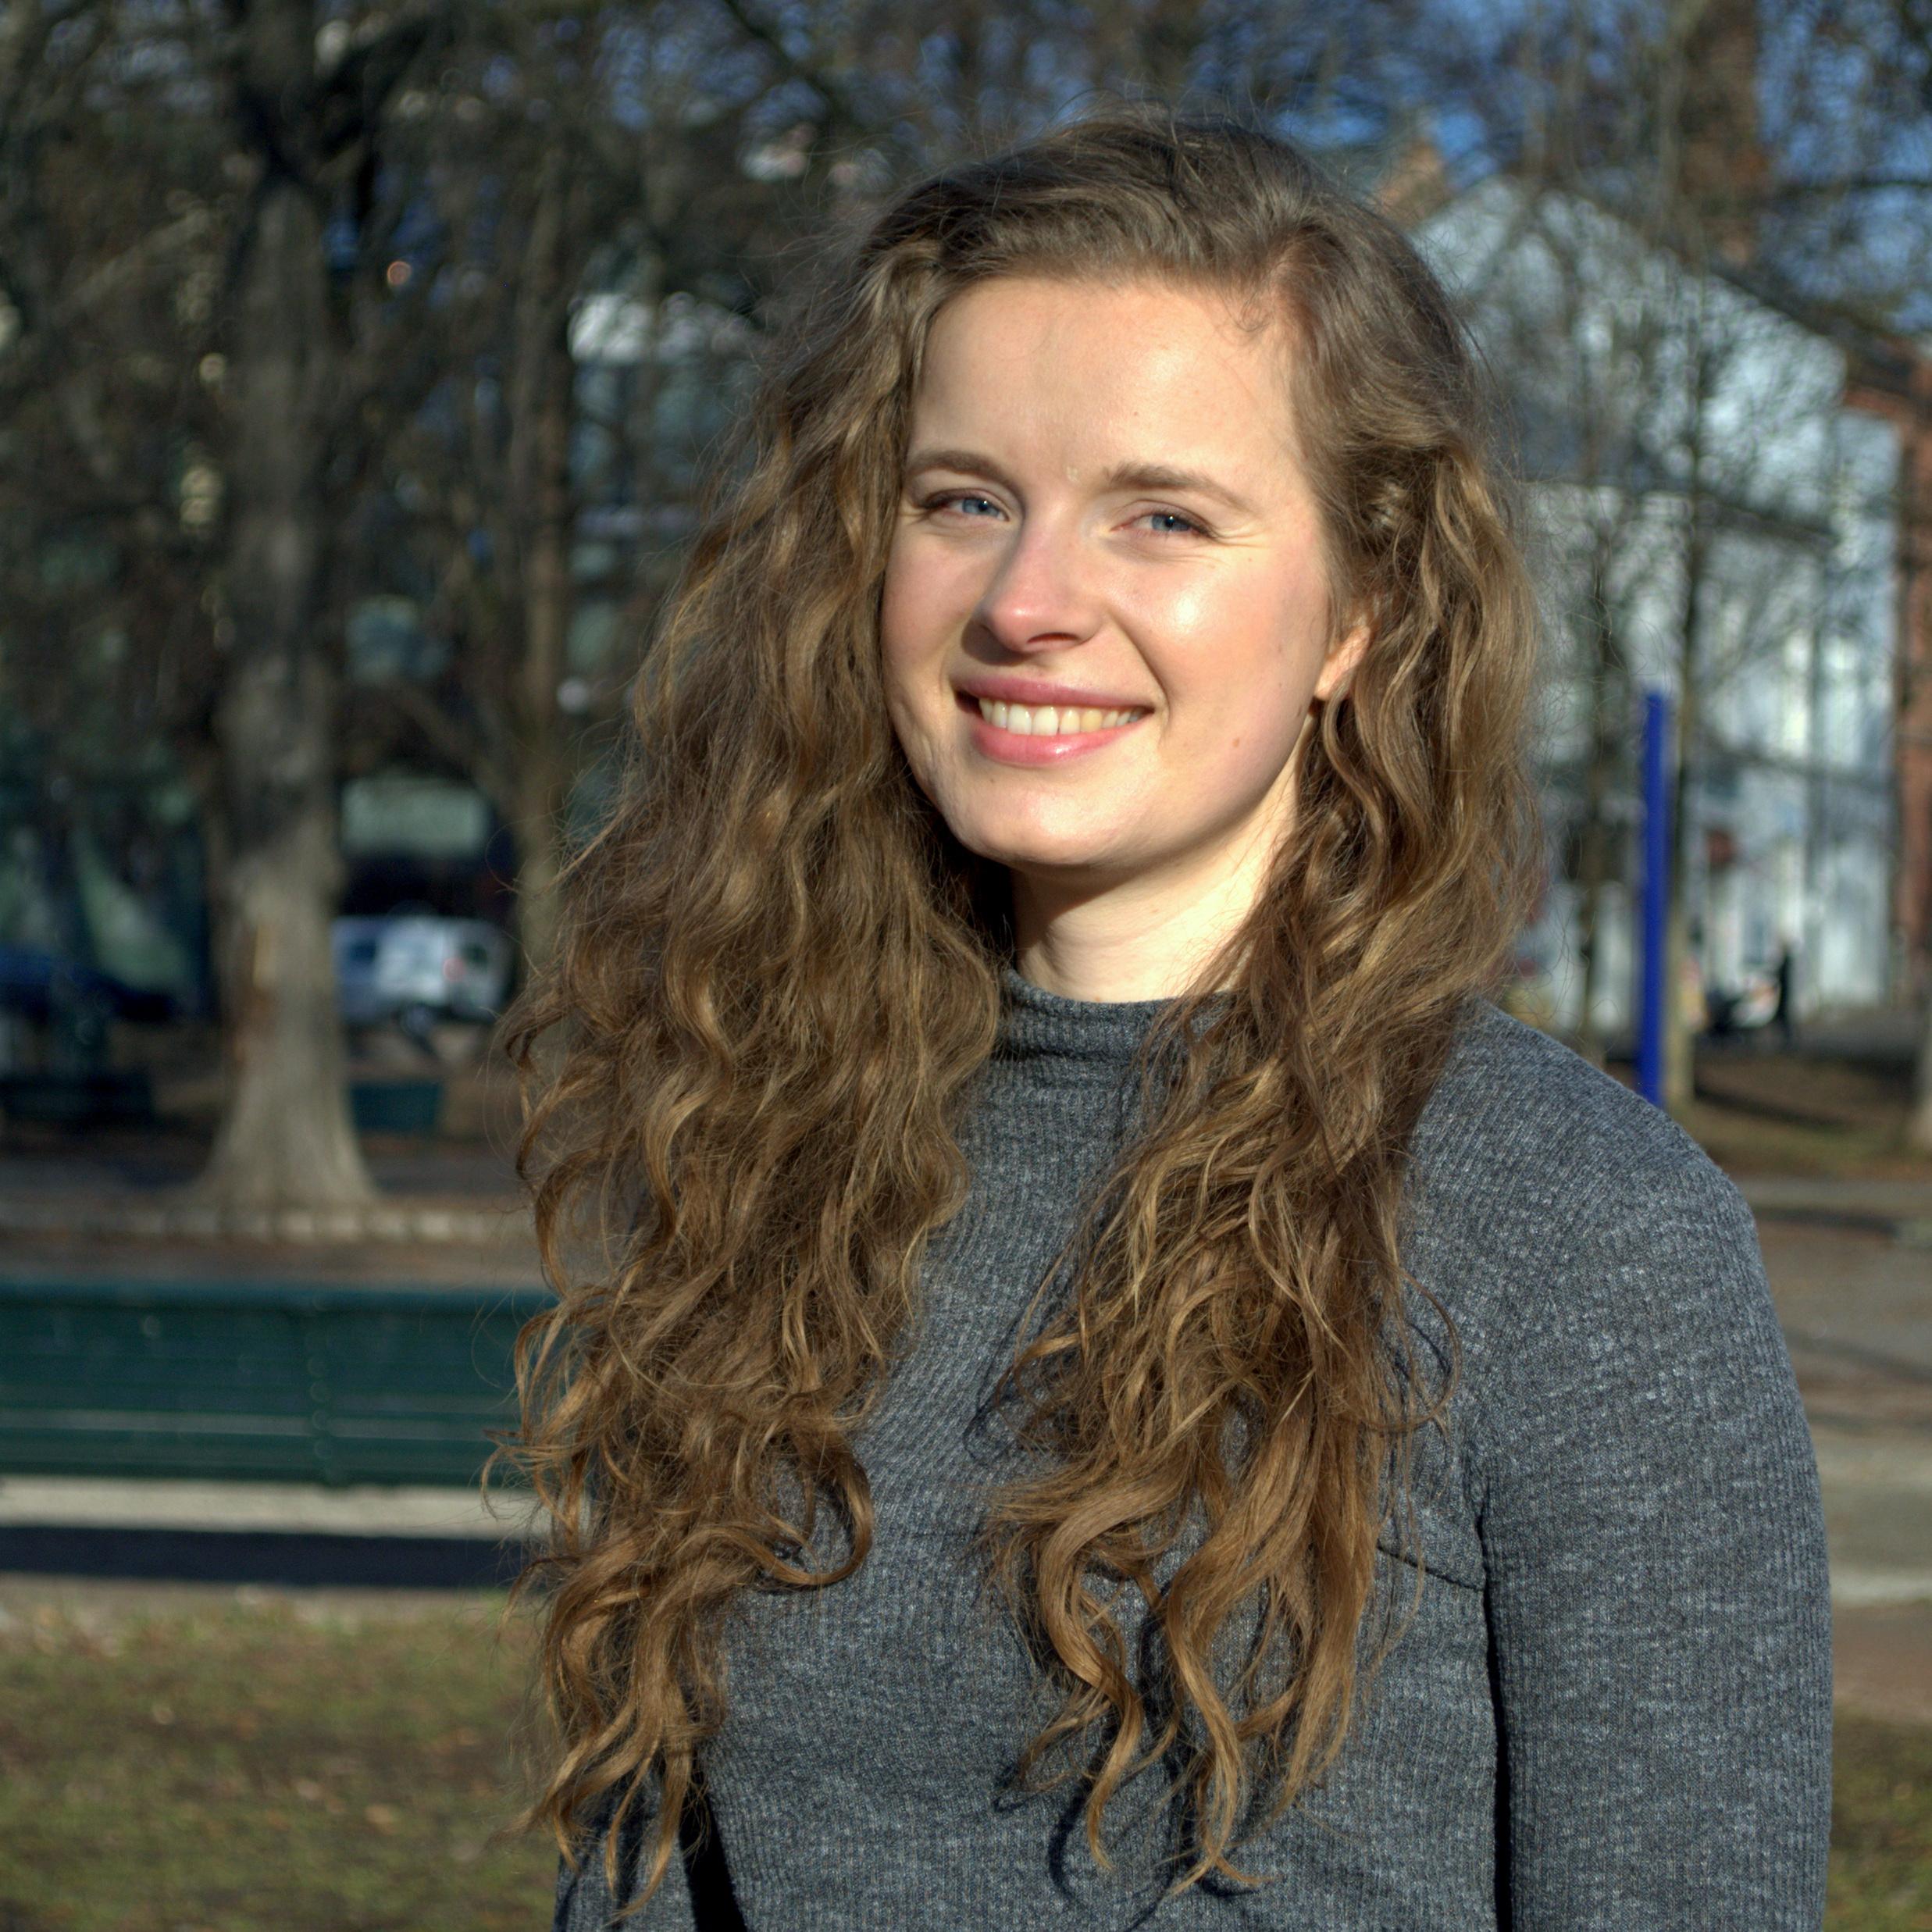 Musikkteaterhøyskolen - Marthe Skeie